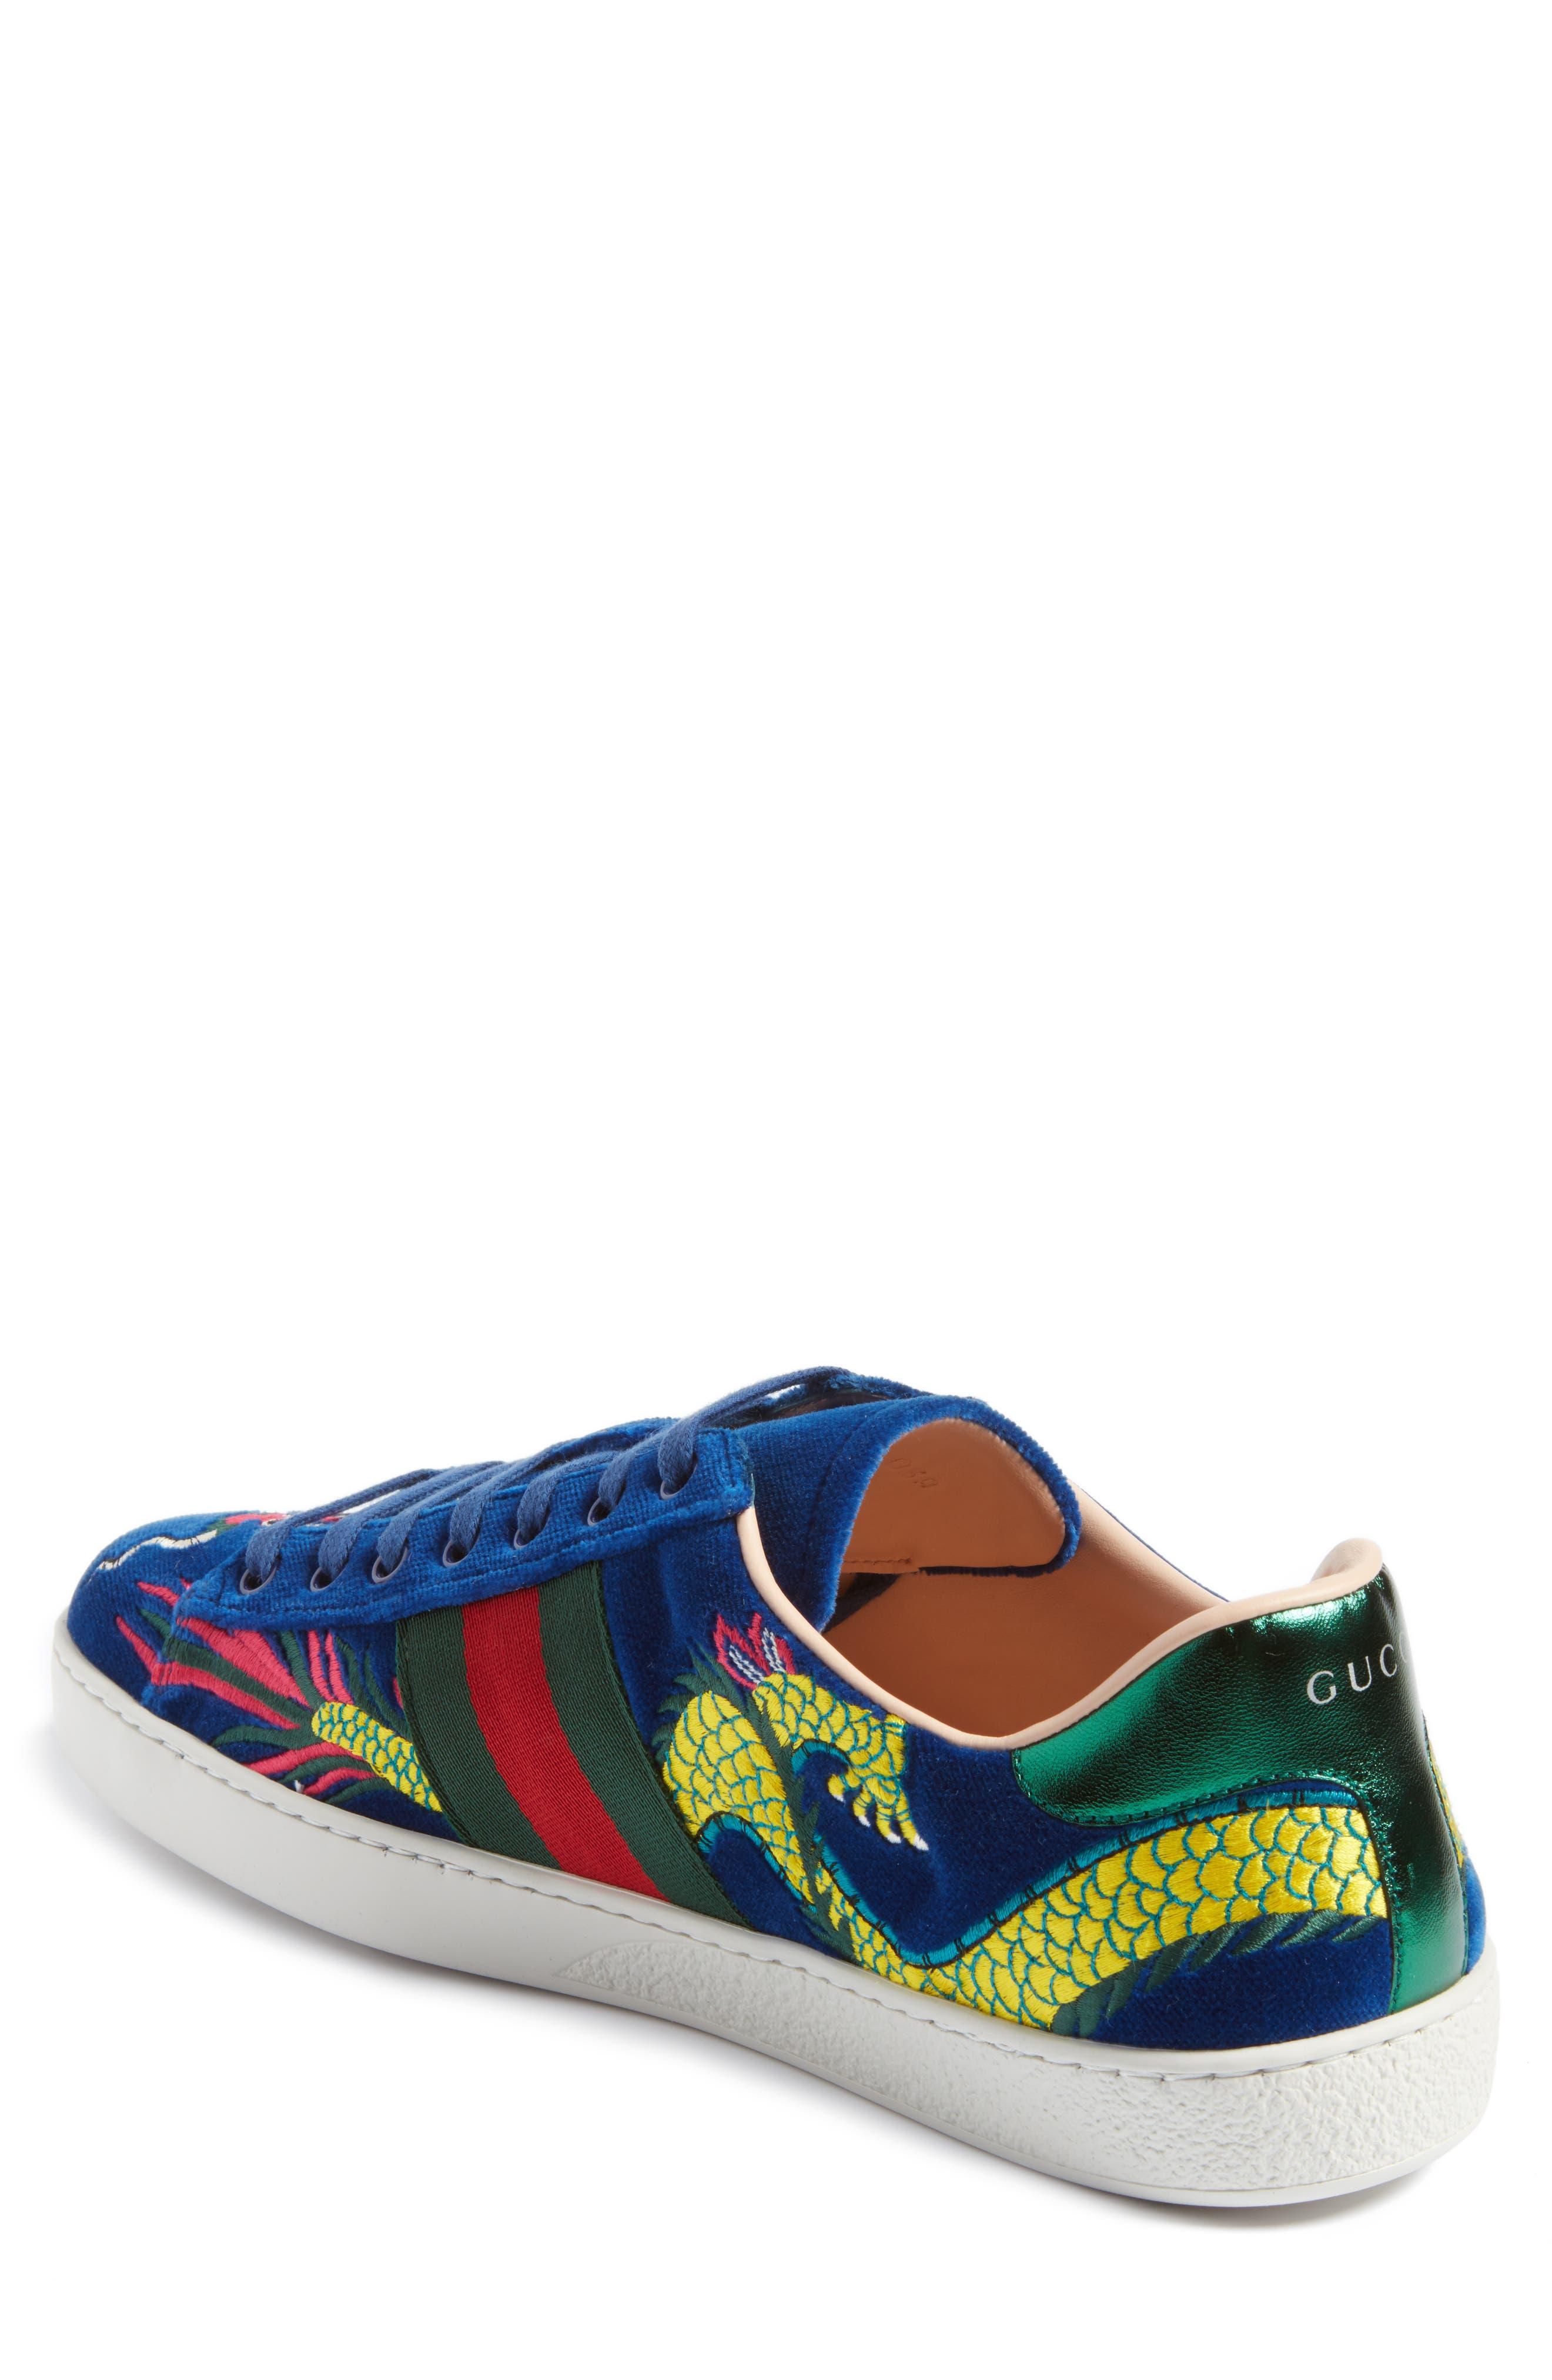 New Ace Dragon Sneaker,                             Alternate thumbnail 2, color,                             493